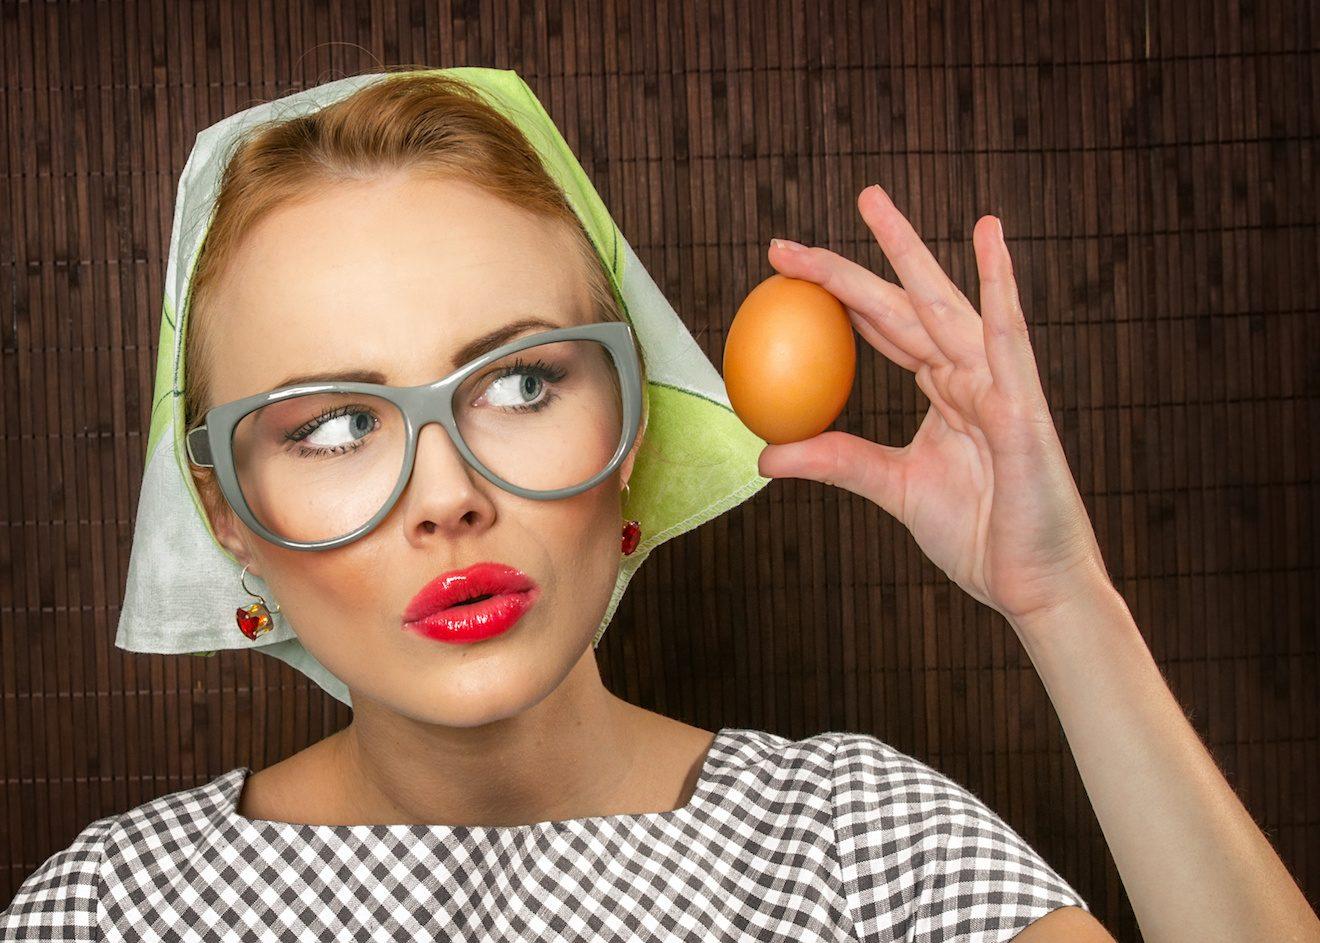 experiential retailing beats old metrics